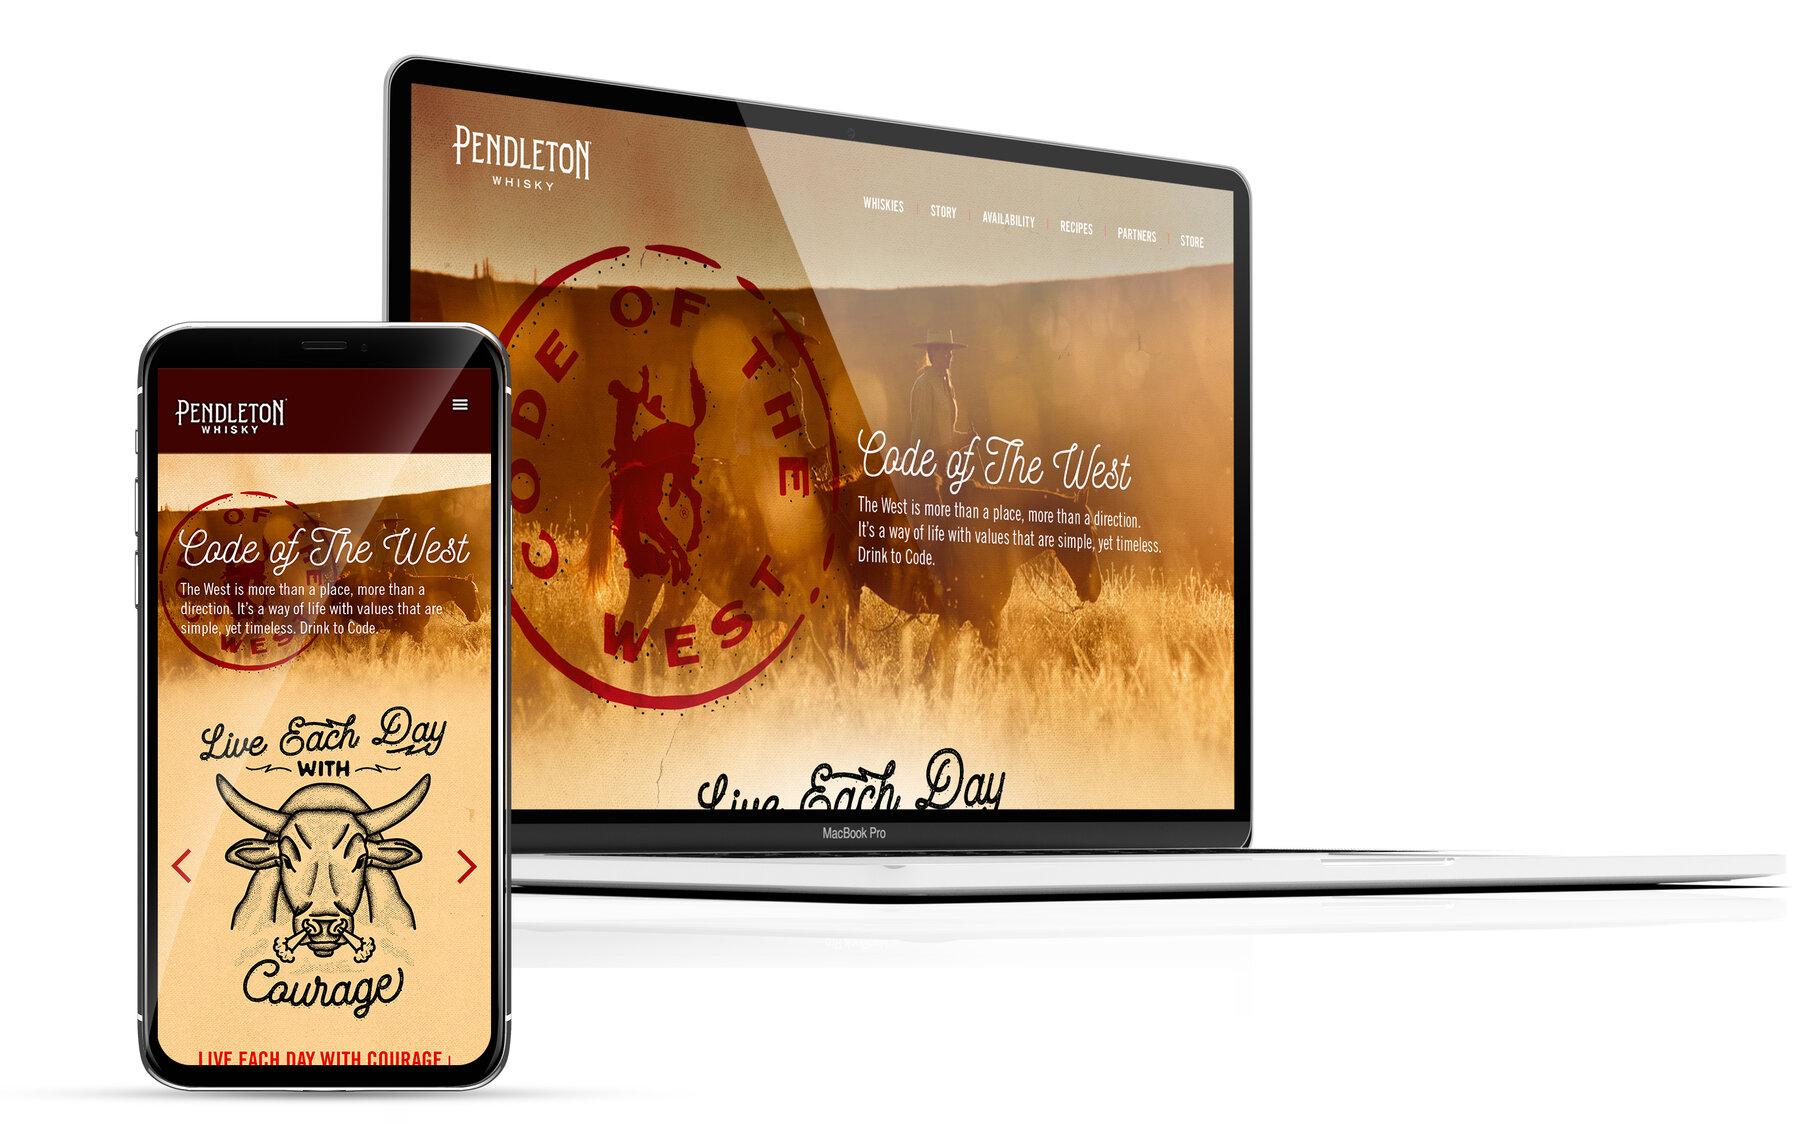 Pendleton website